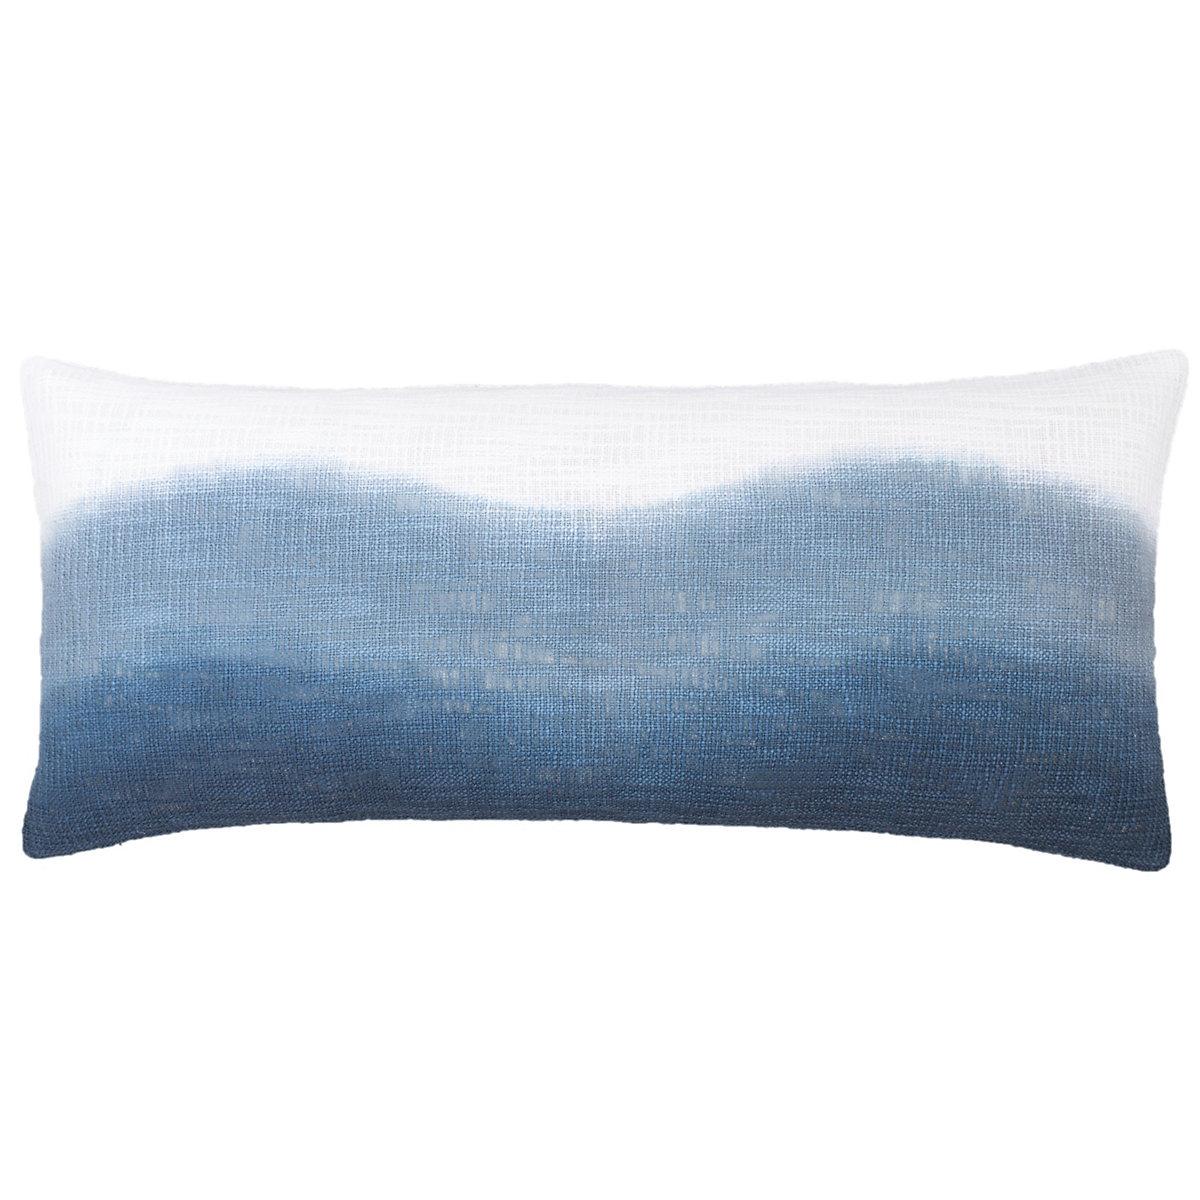 . breakwater blue decorative pillow  pine cone hill